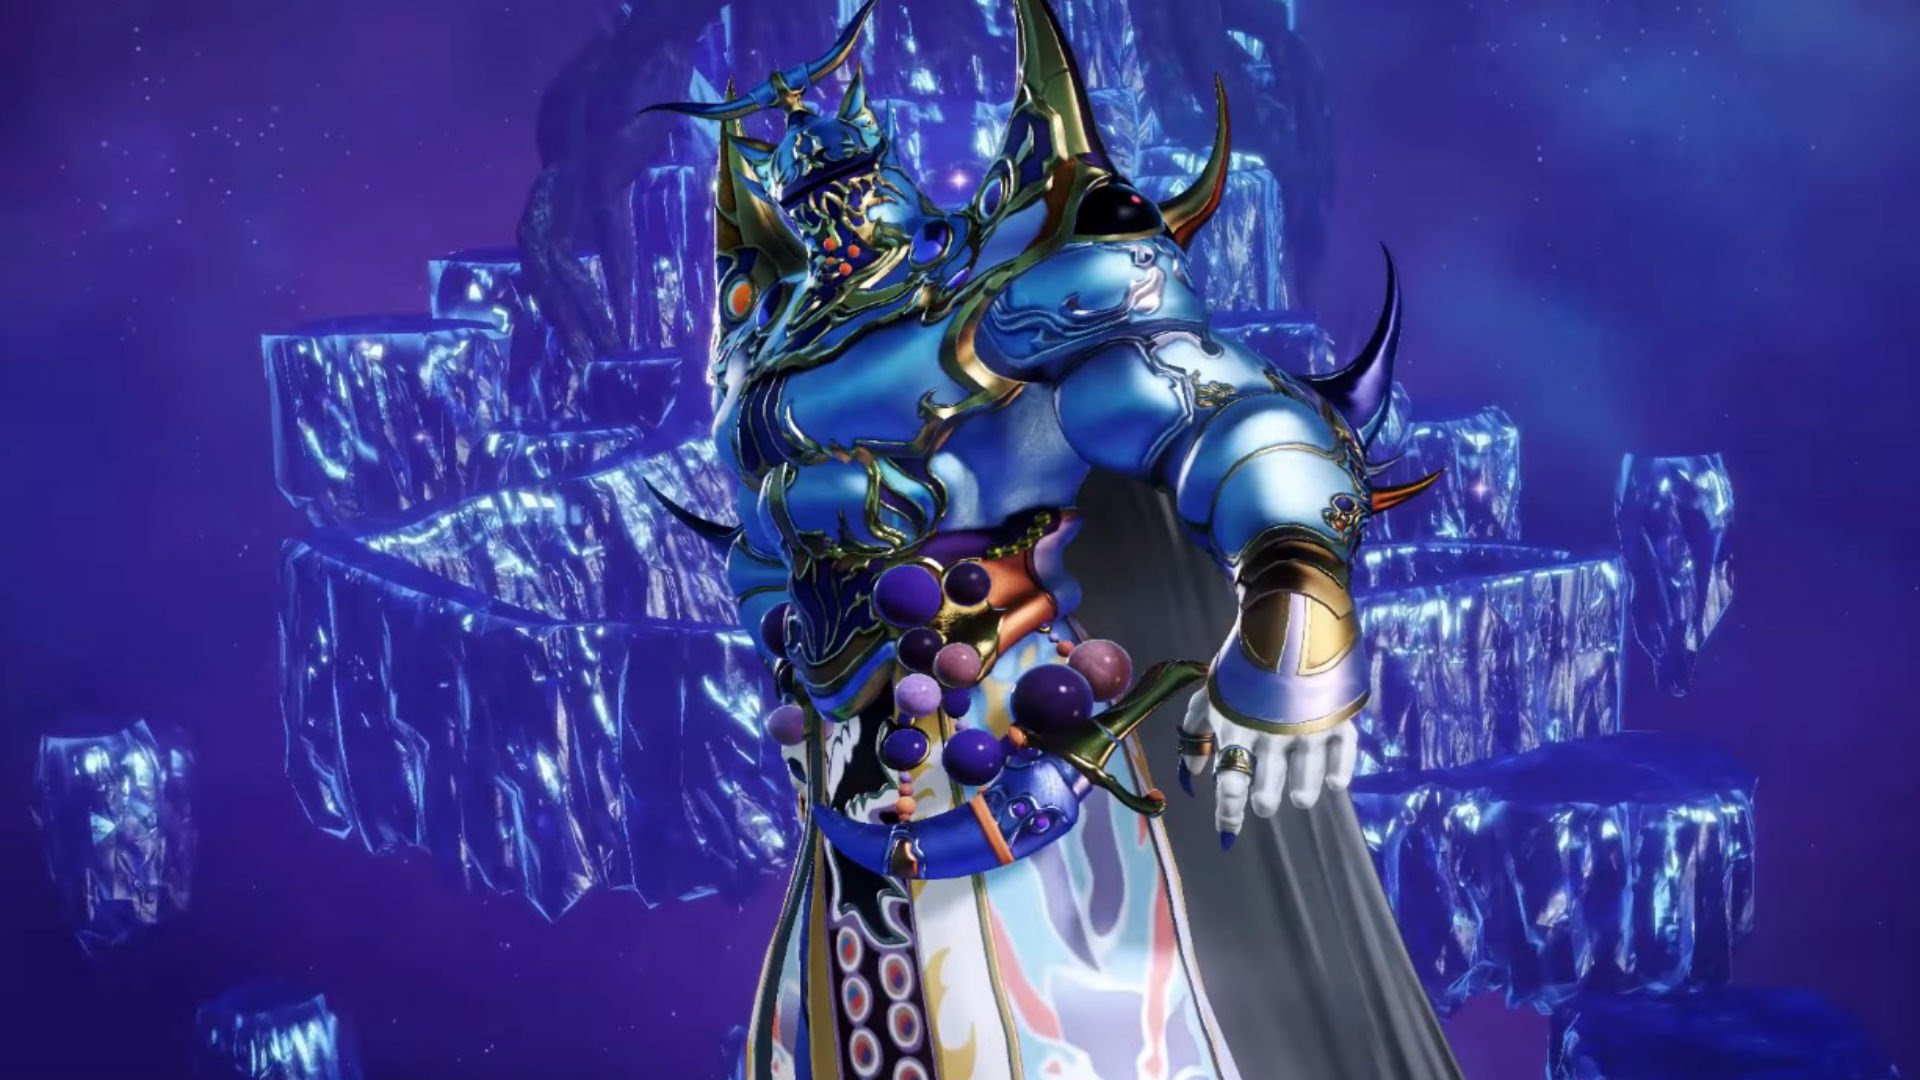 Final Fantasy V's Exdeath gon' give it to ya in Dissidia Final Fantasy arcade screenshot